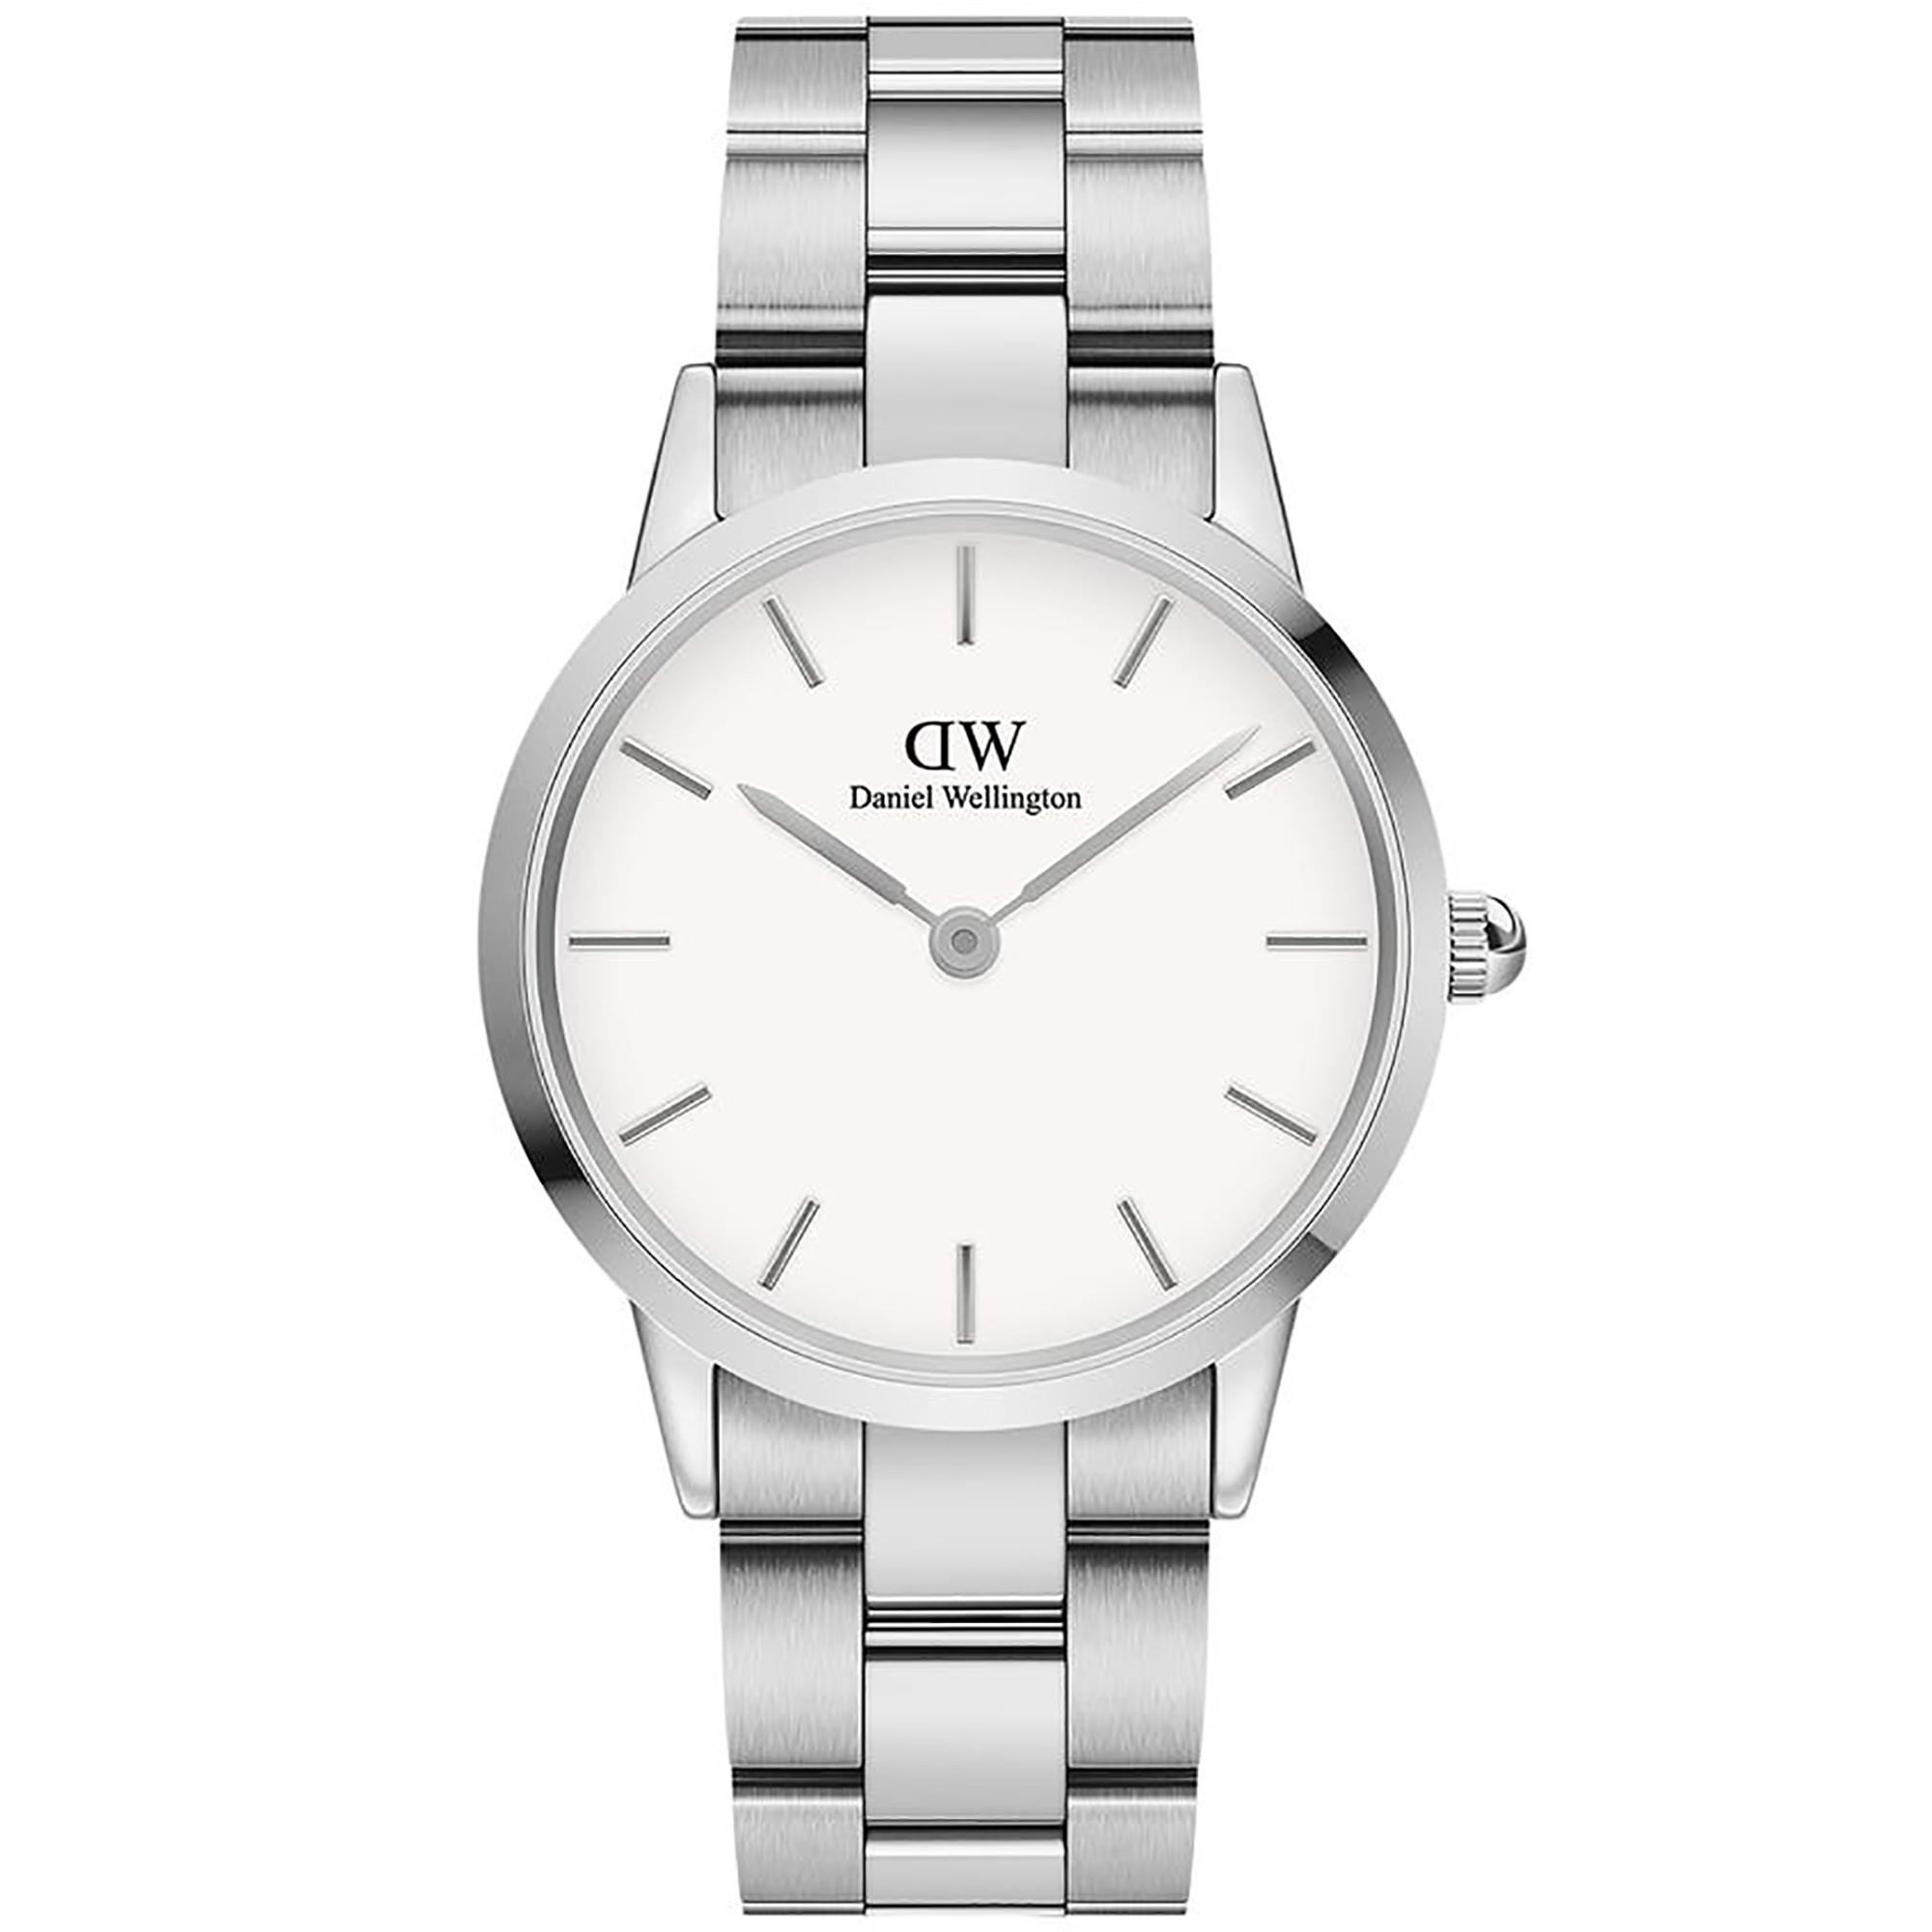 Orologio Iconic Link 36mm Bianco Acciaio DW00100203 - DANIEL WELLINGTON